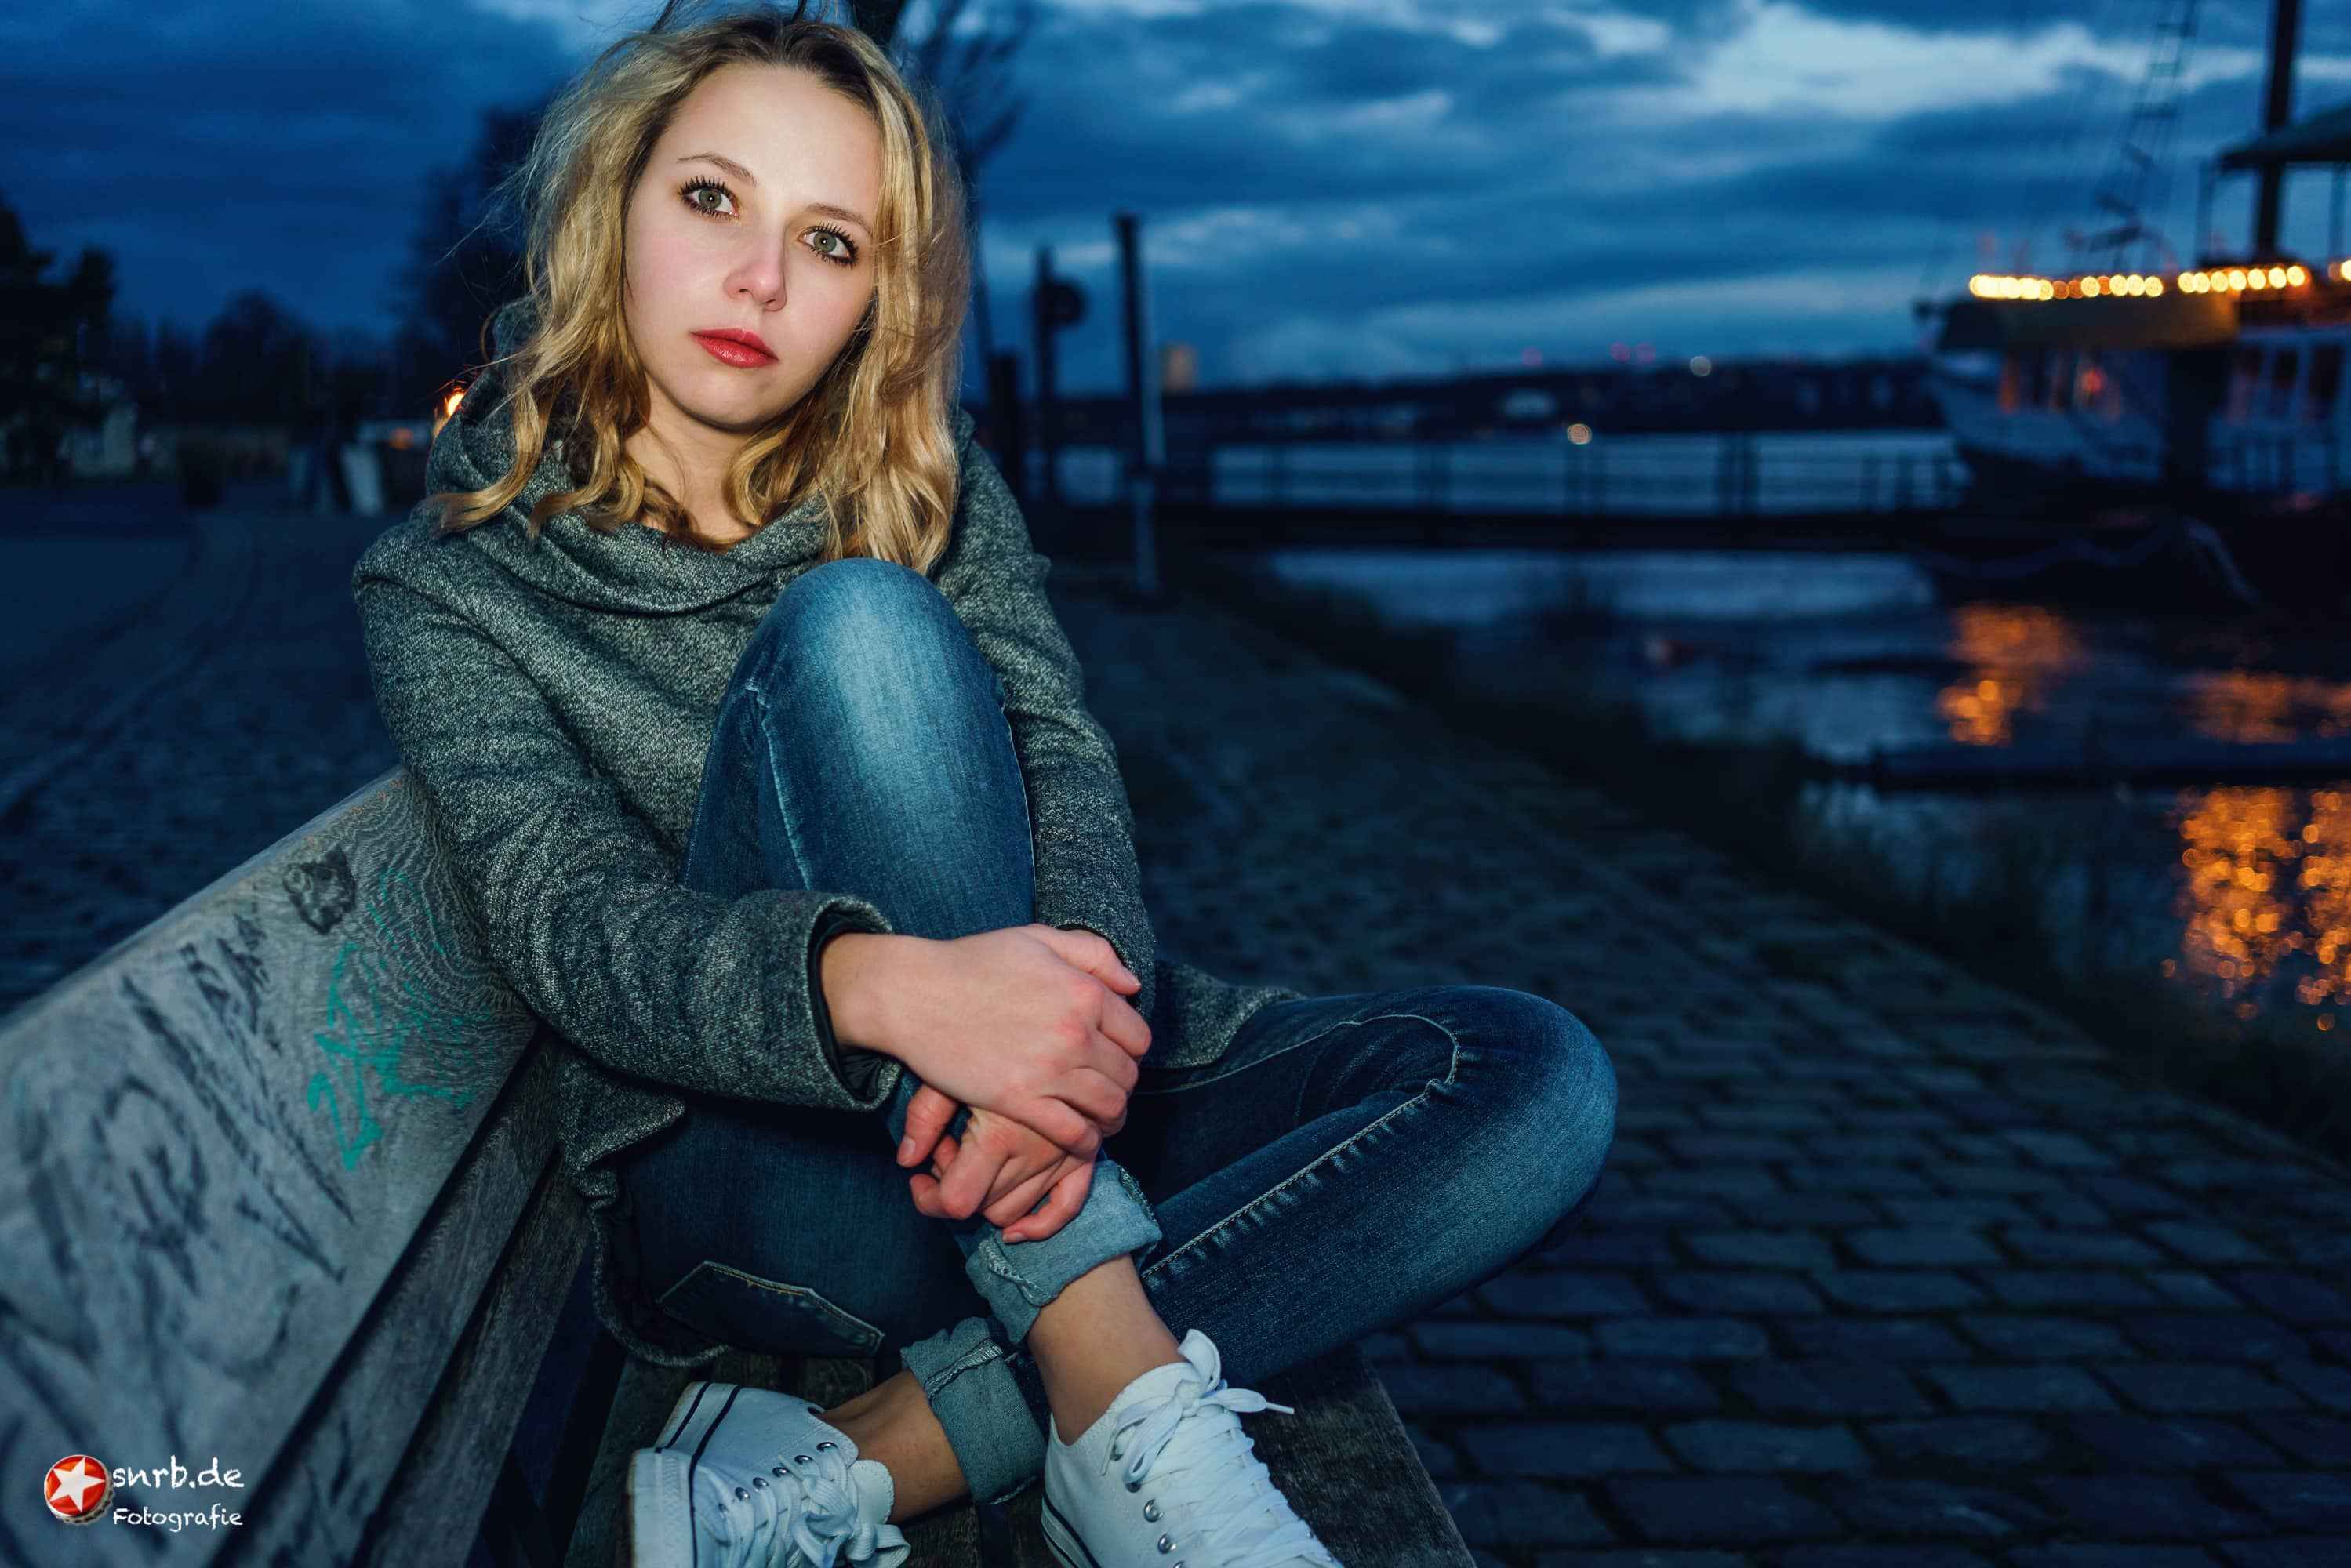 snrb-menschenbilder-portrait-dunkelheit-mainz-kastel-reduit-janina-stefan-raab